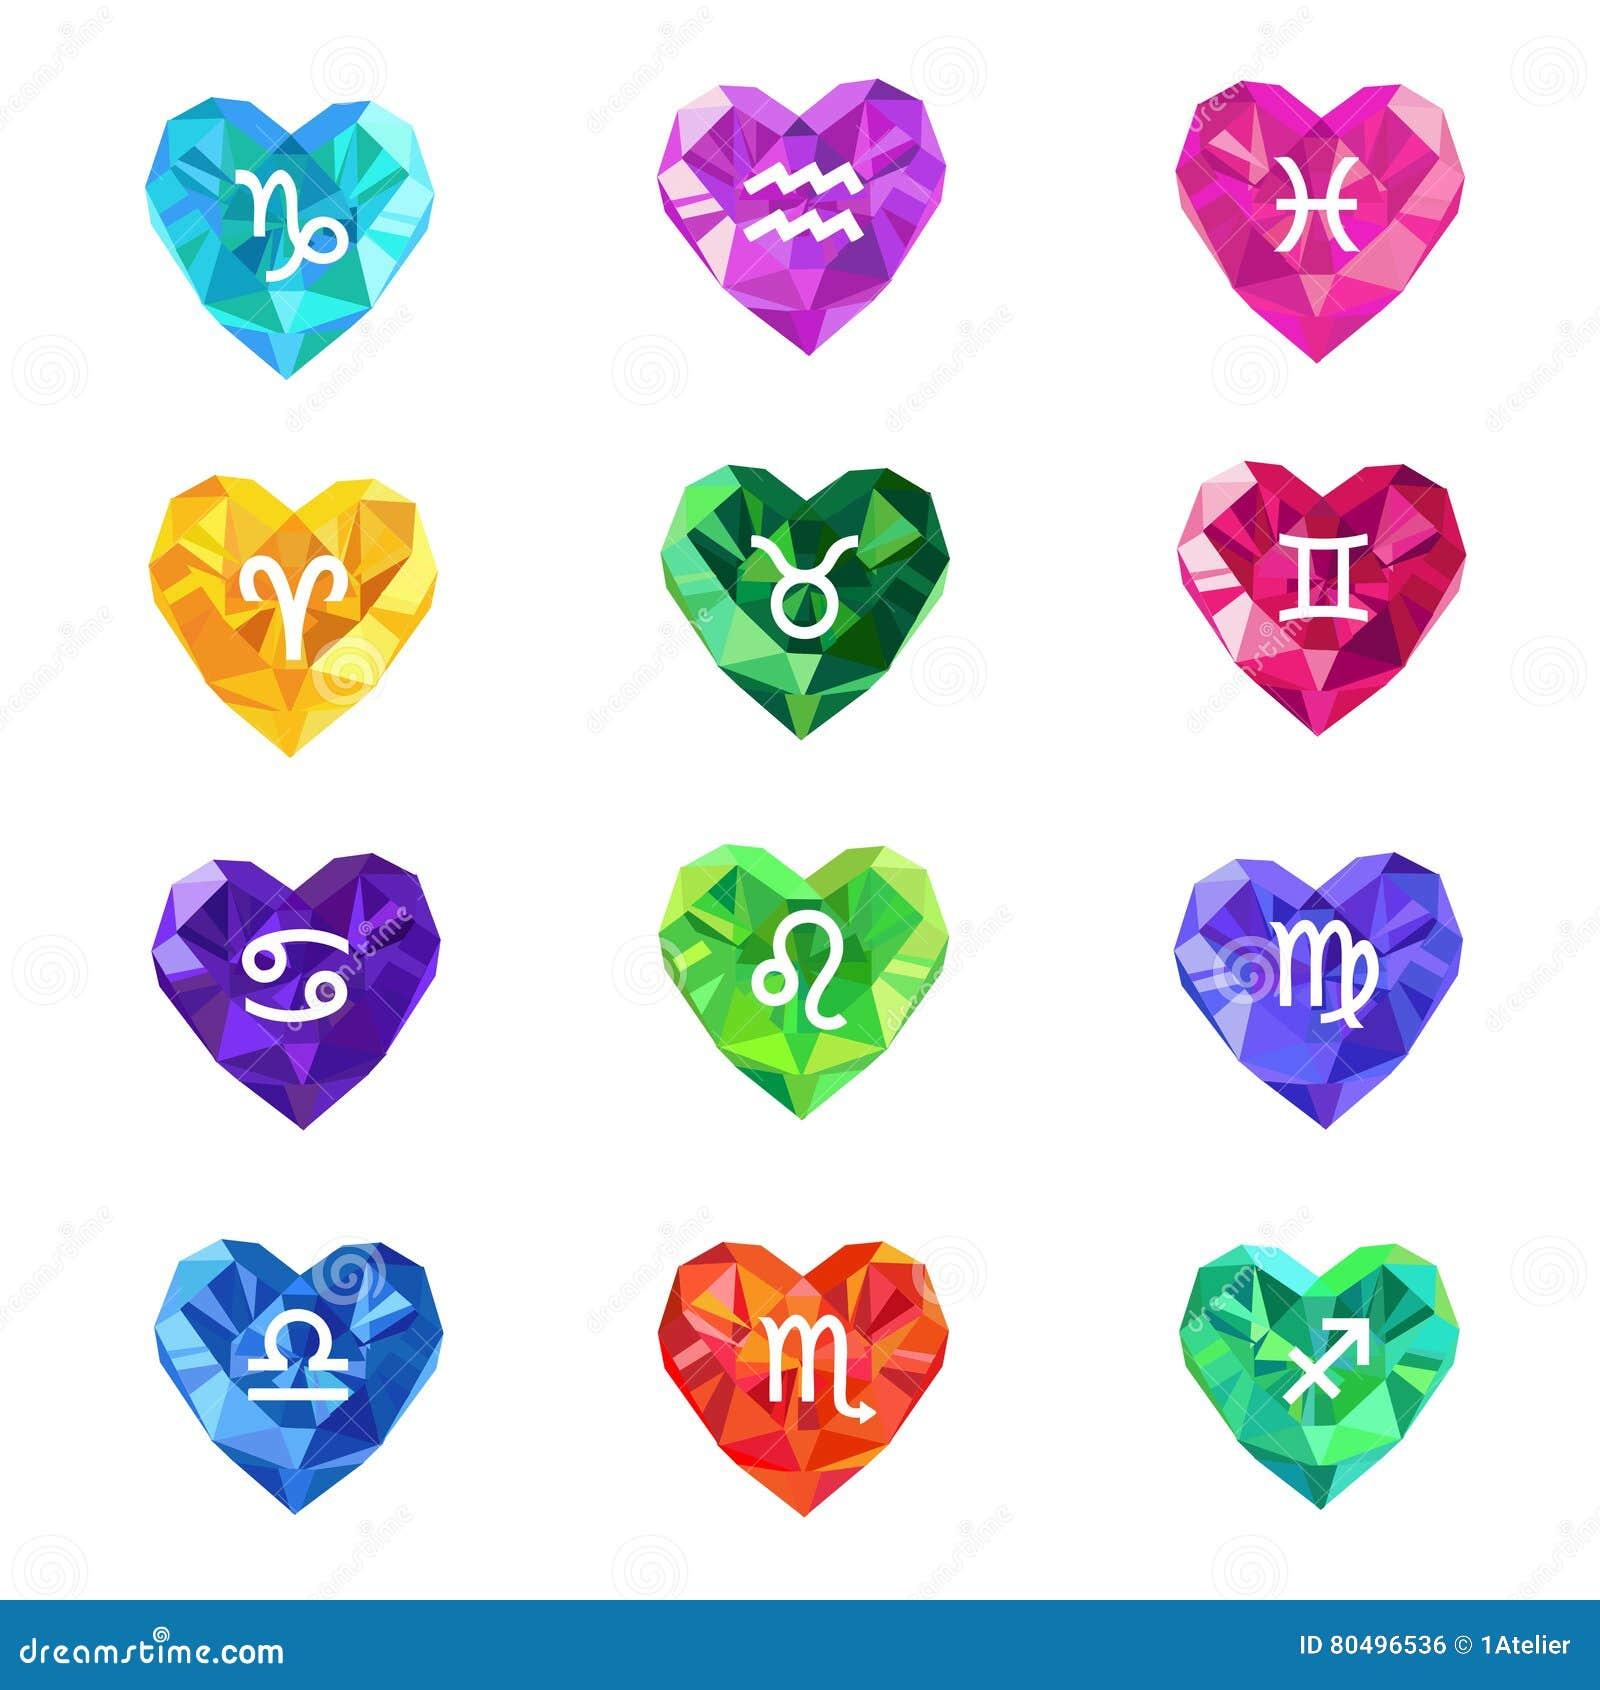 Set Of Crystal Jewel Heart Shaped Astrological Zodiac Signs Symbols